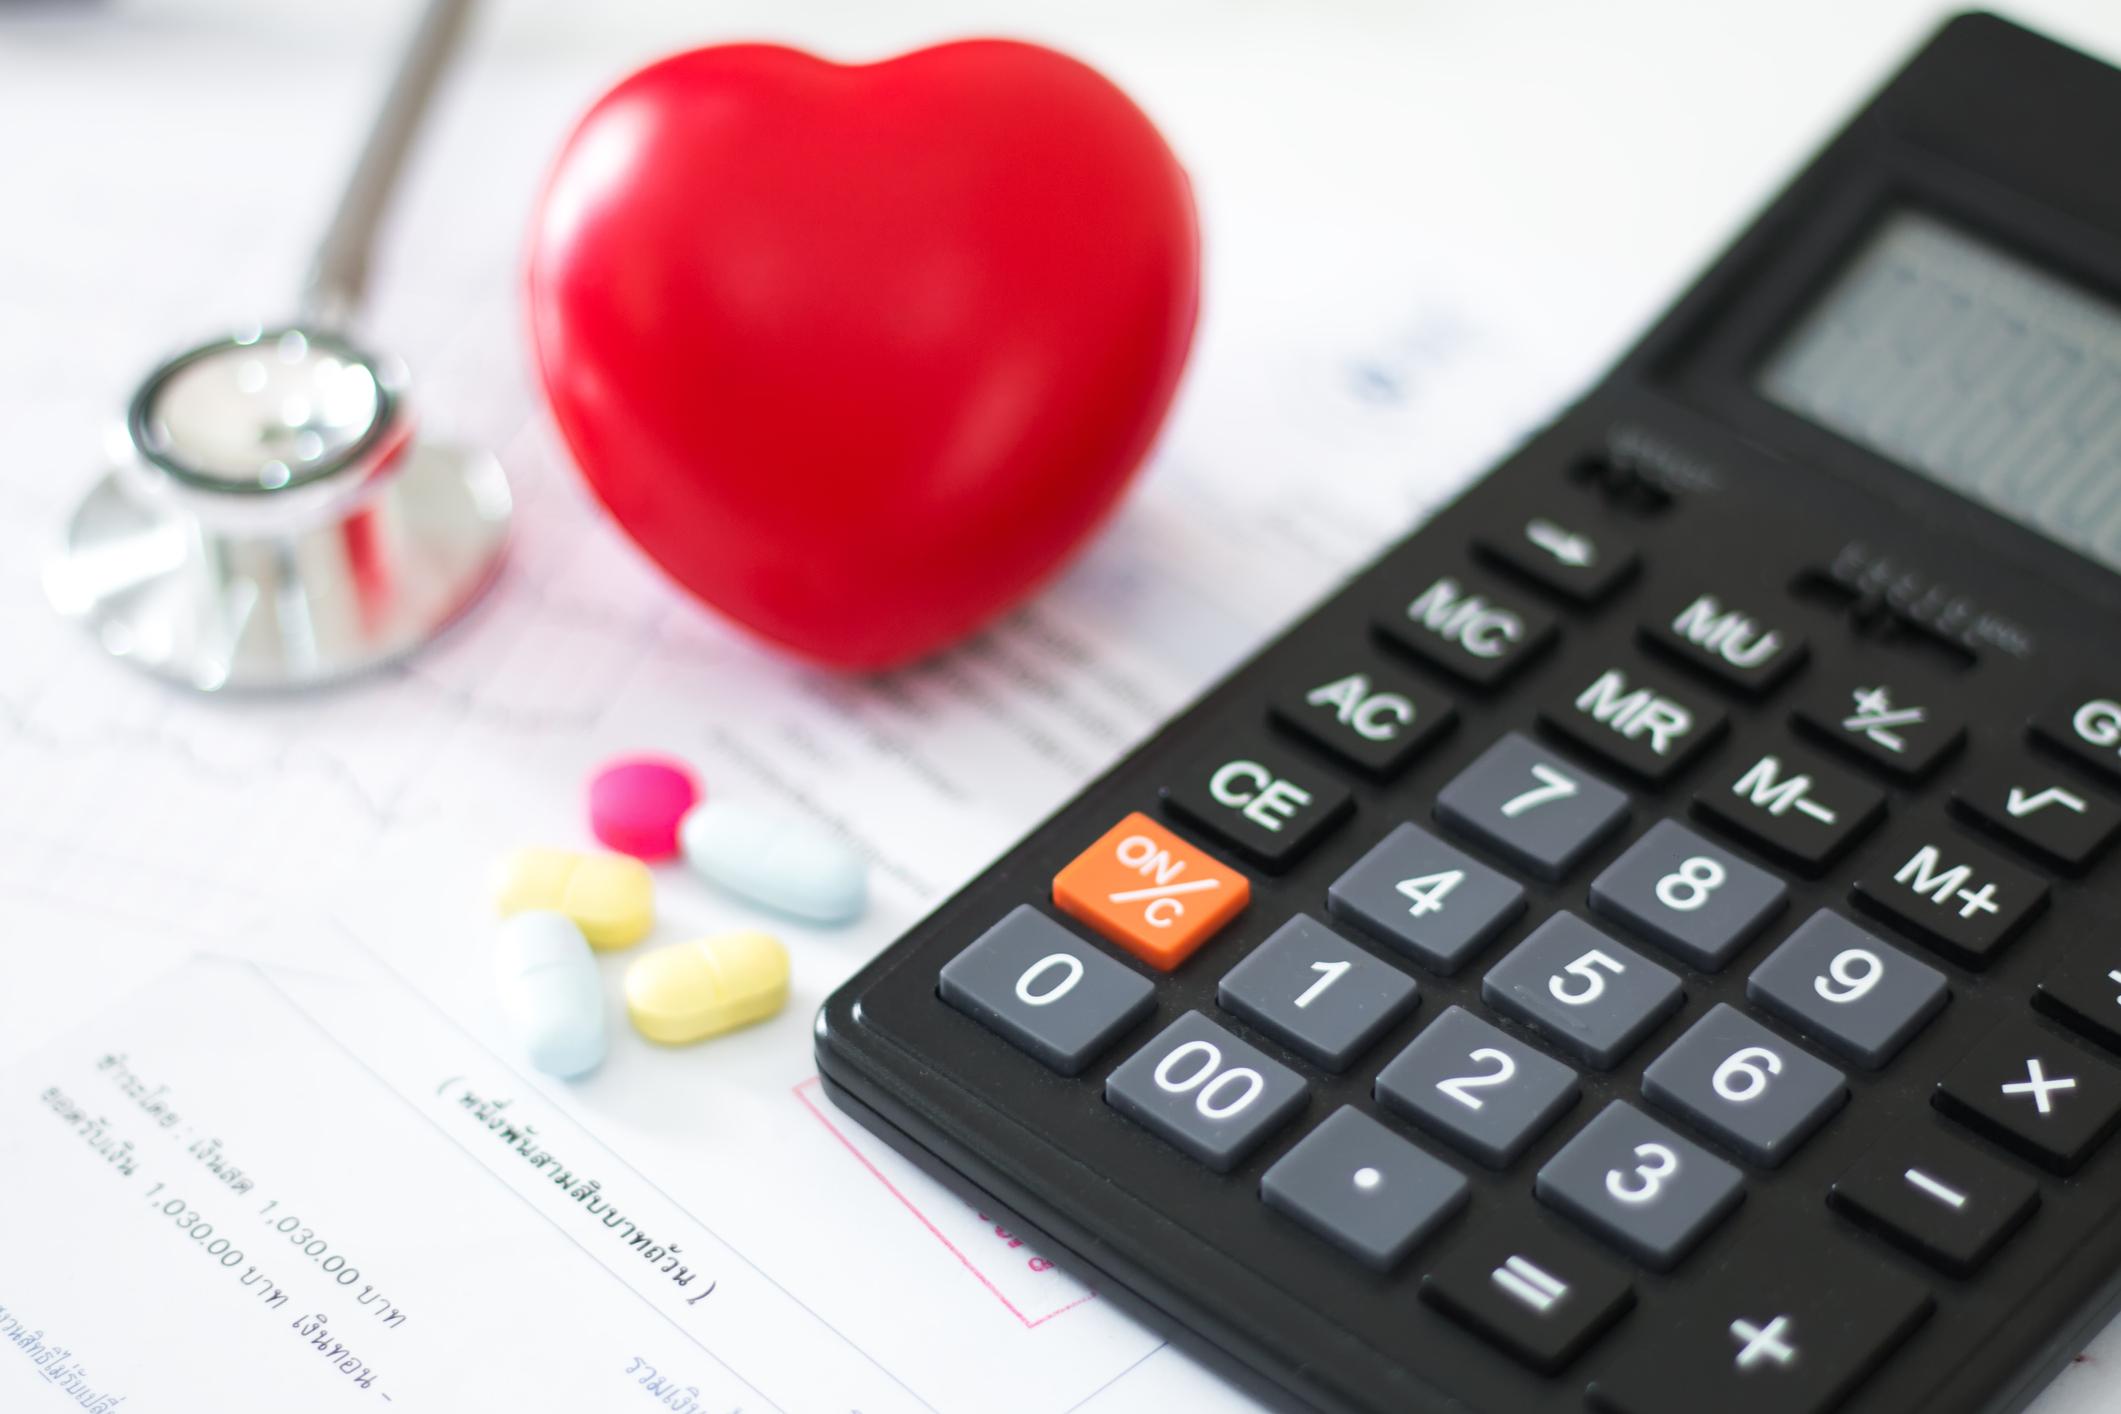 cost of health care. concept,Heart disease,Heart disease center ,Heart medication